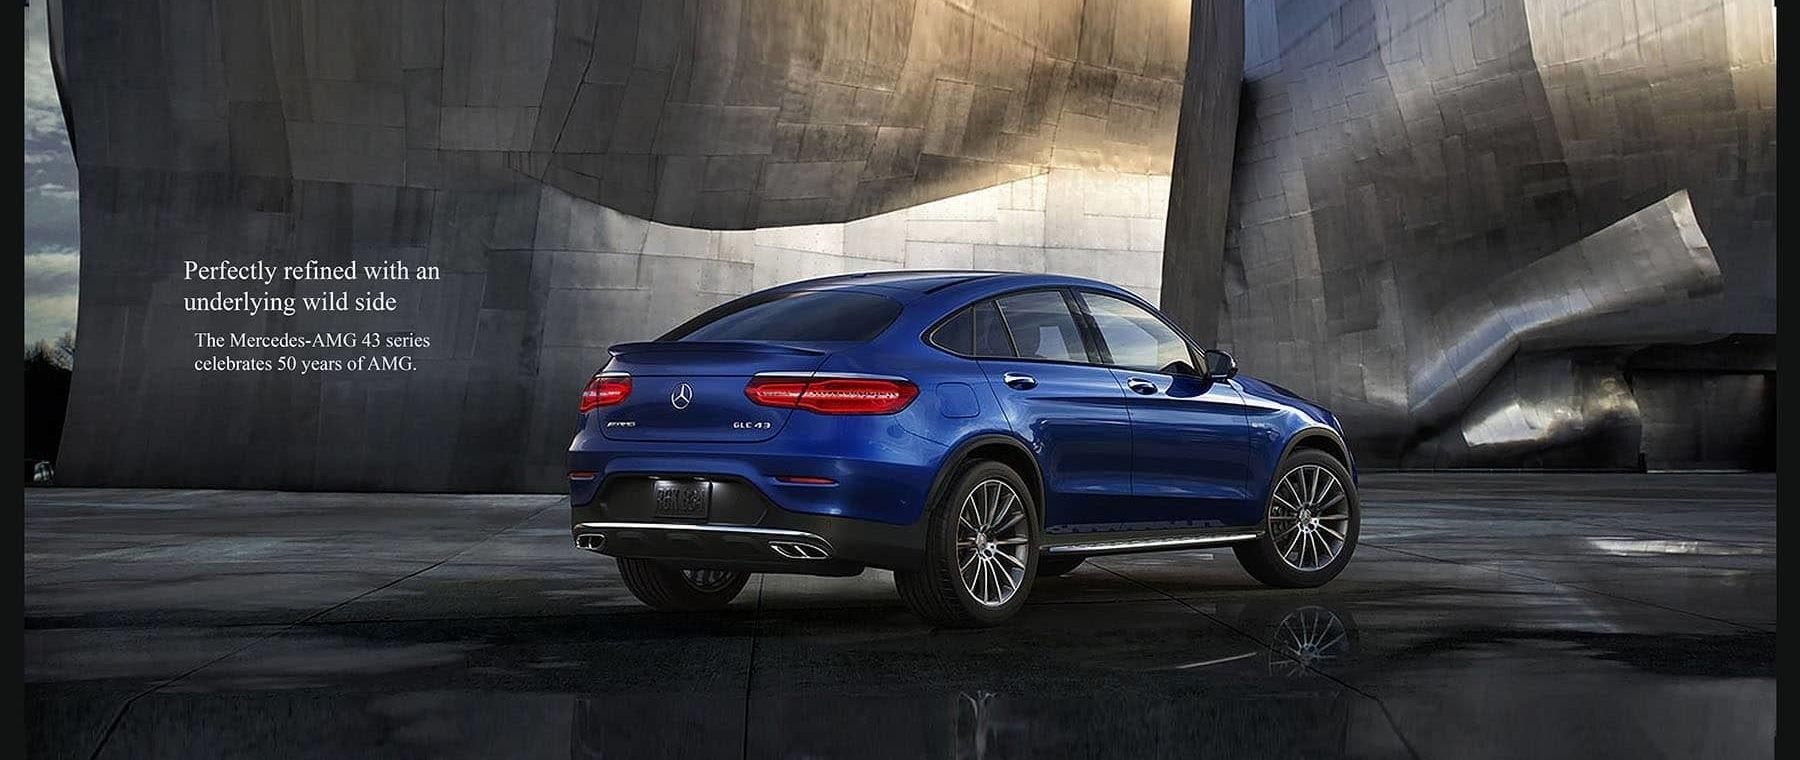 Knopf automotive mercedes benz and porsche dealer in for Mercedes benz allentown pennsylvania